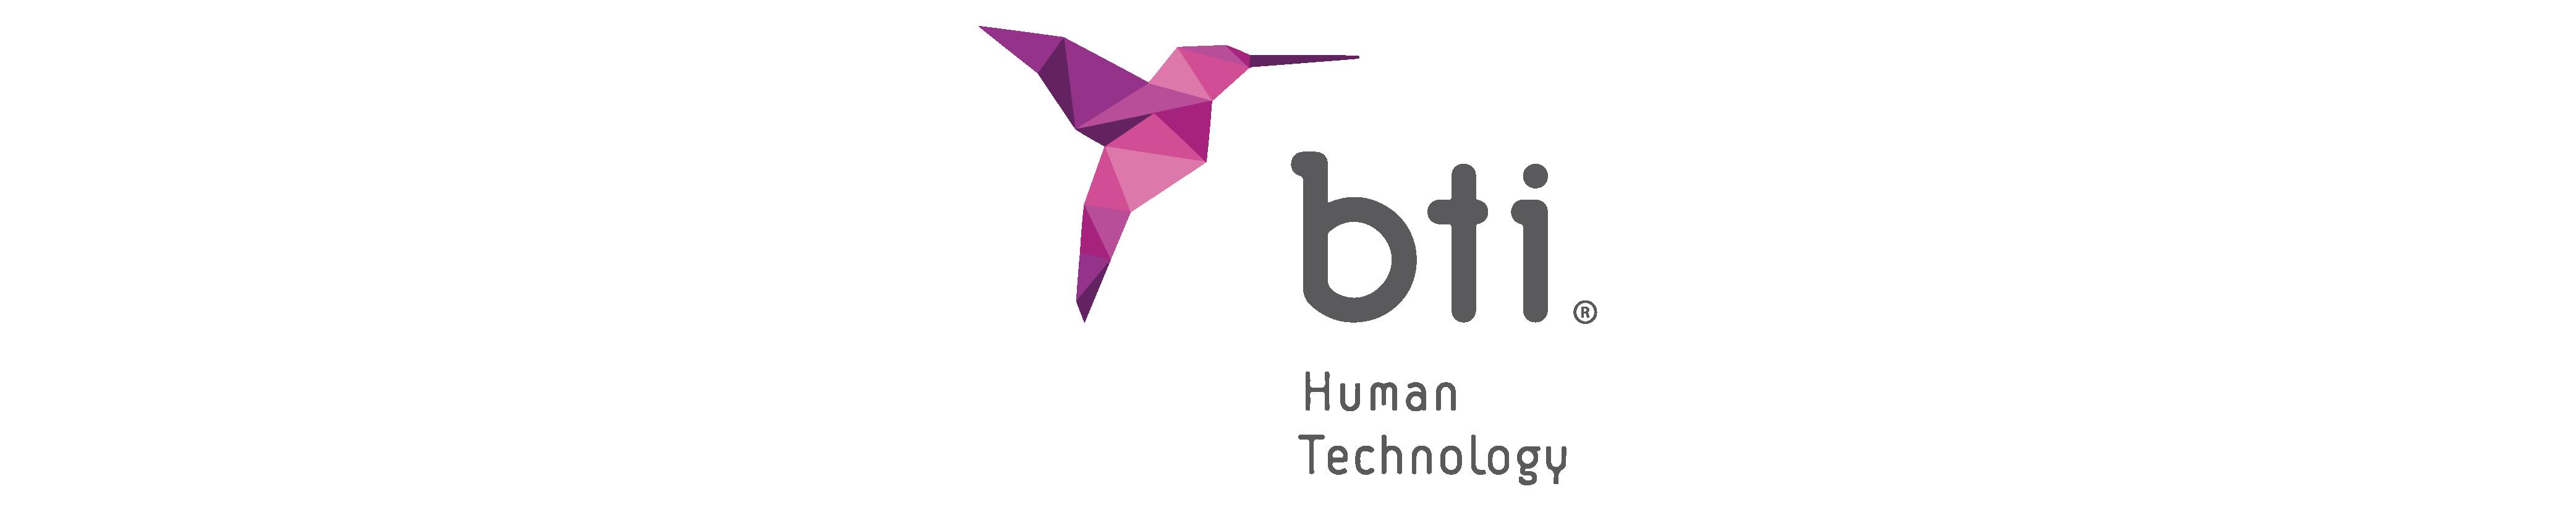 bti-logo-atrolife-01